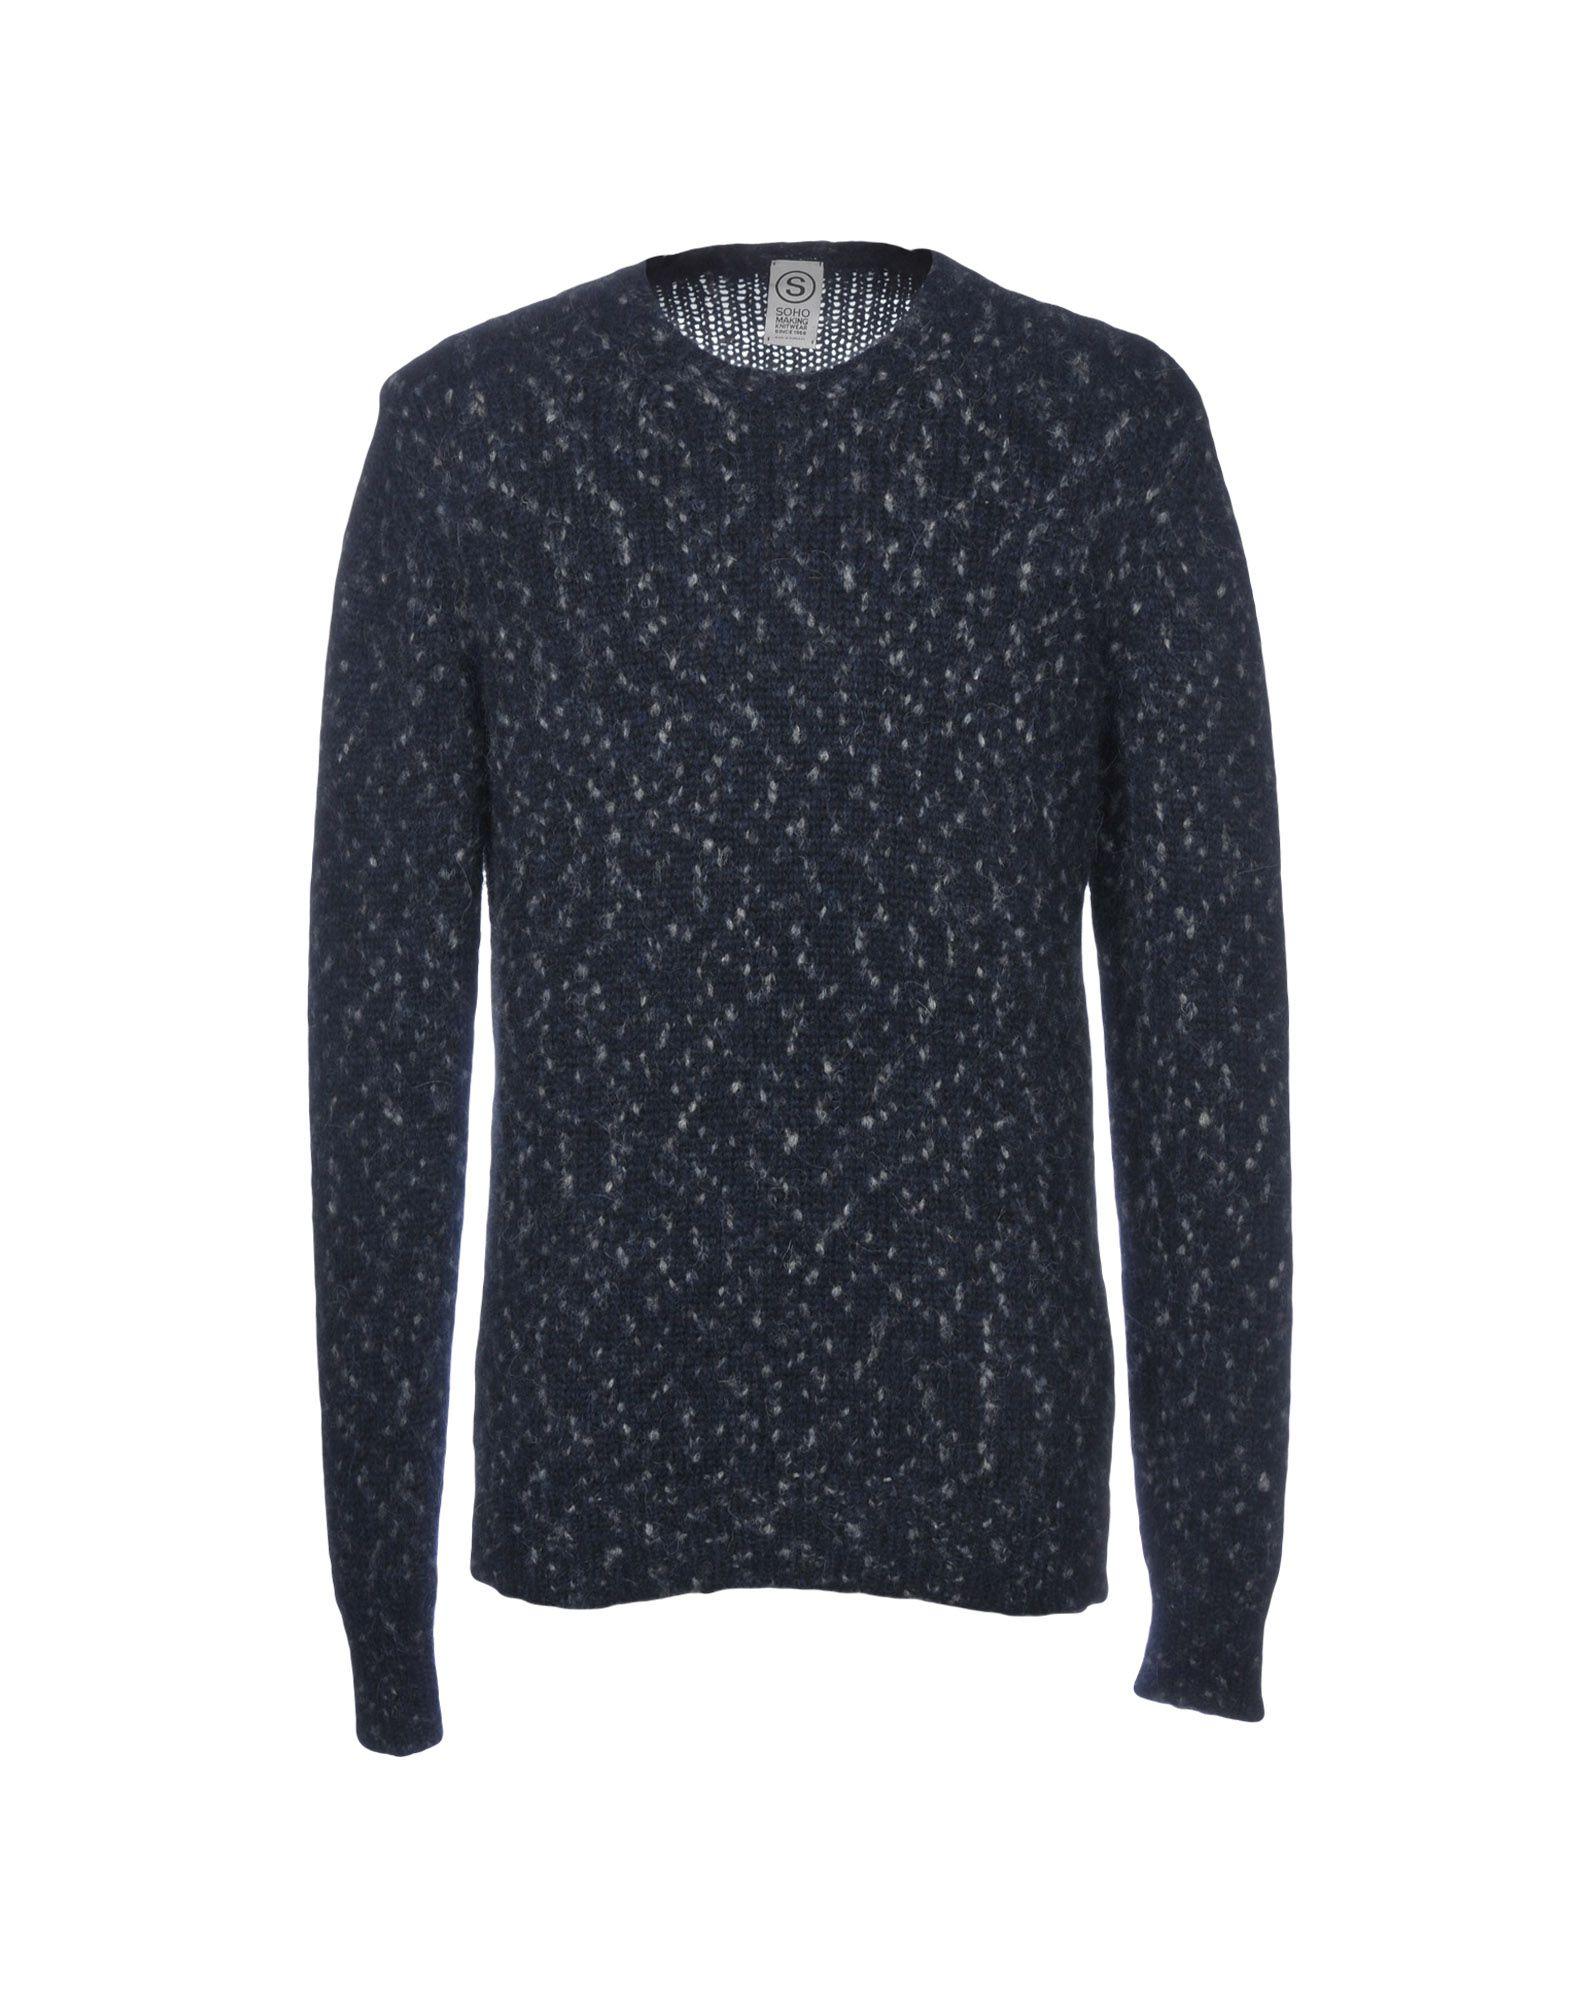 SOHO Sweater in Dark Blue